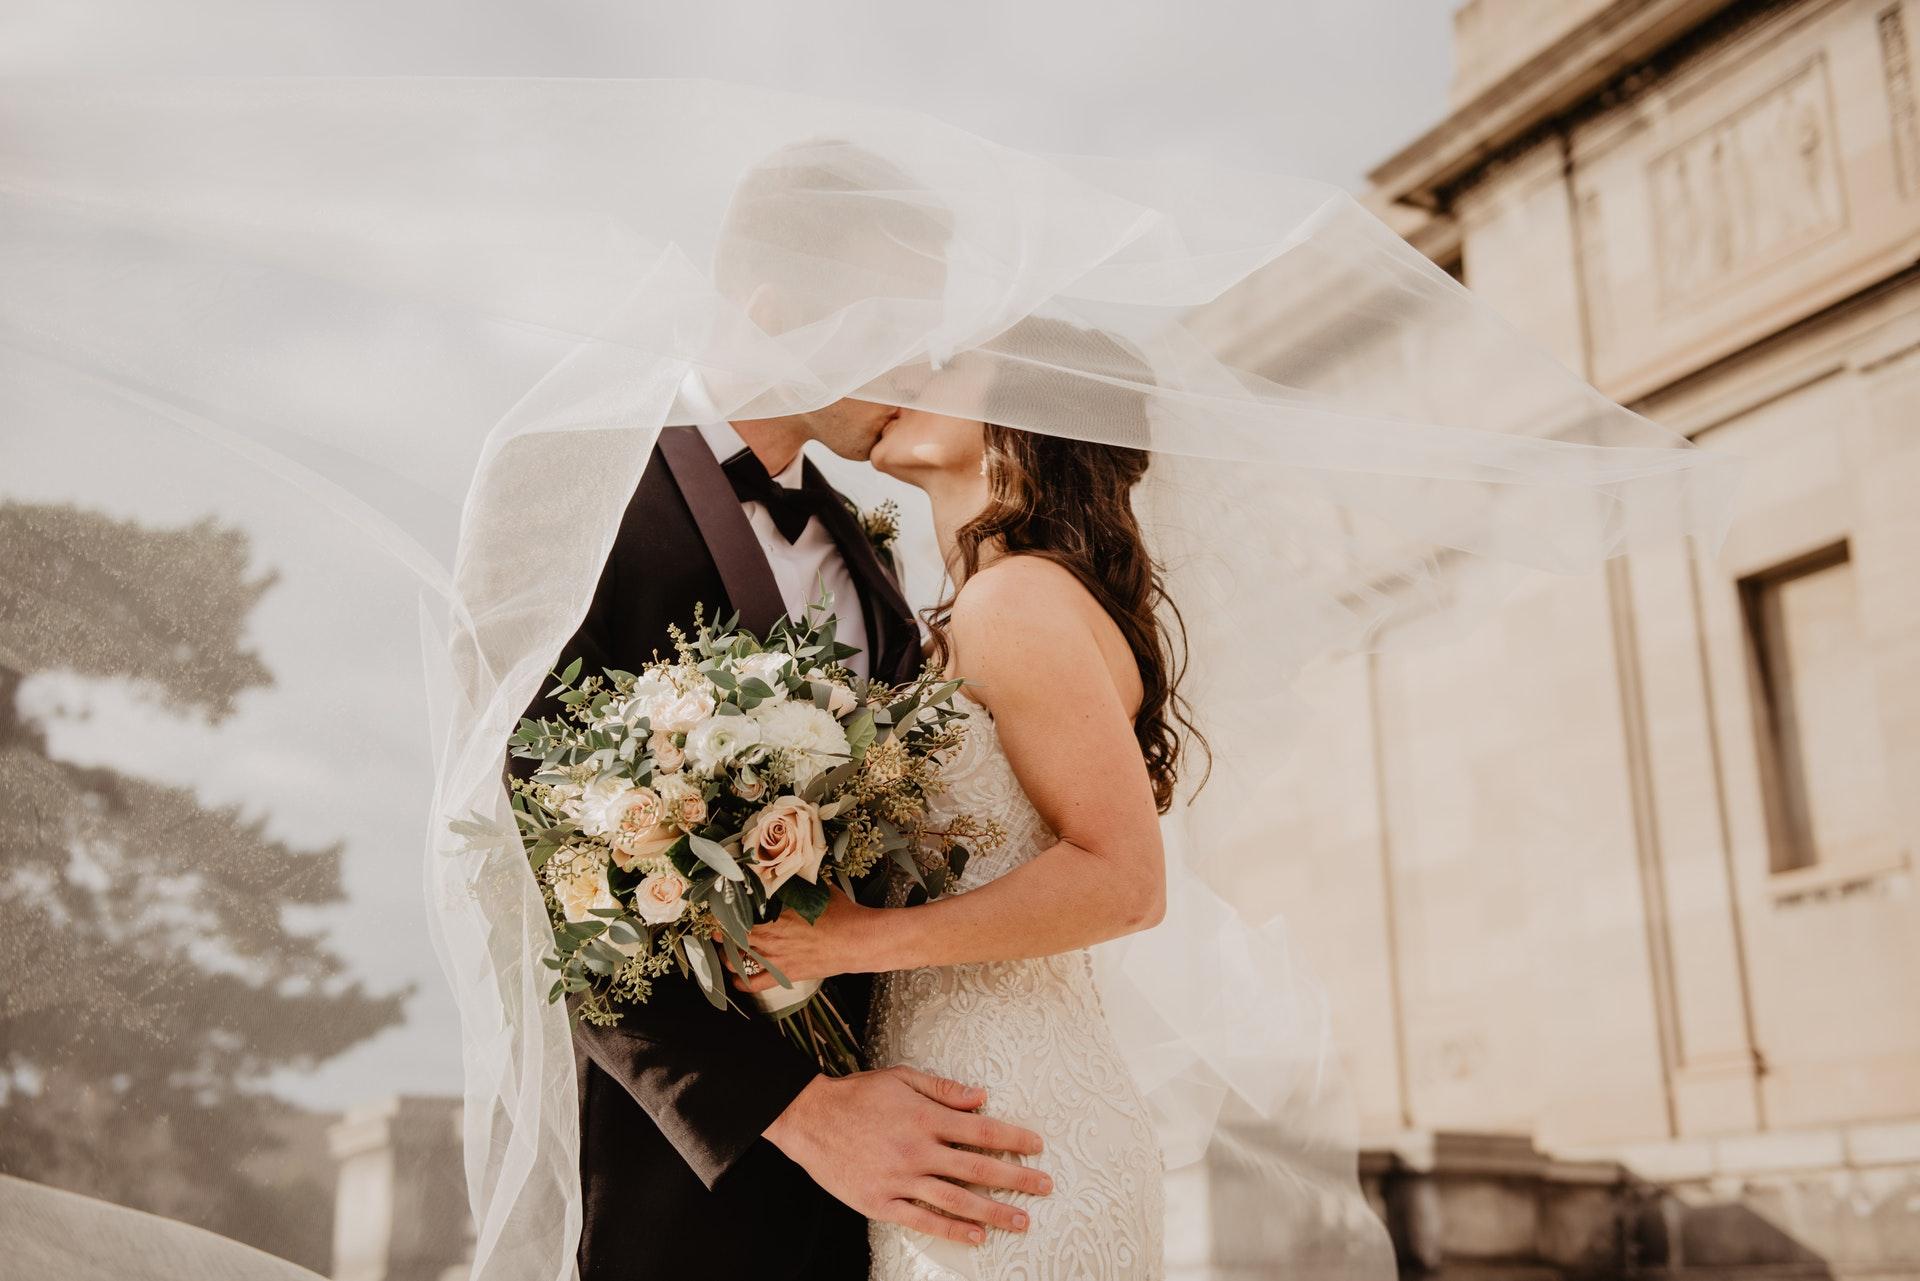 wedding planner à Toulouse : organisateur mariage 31